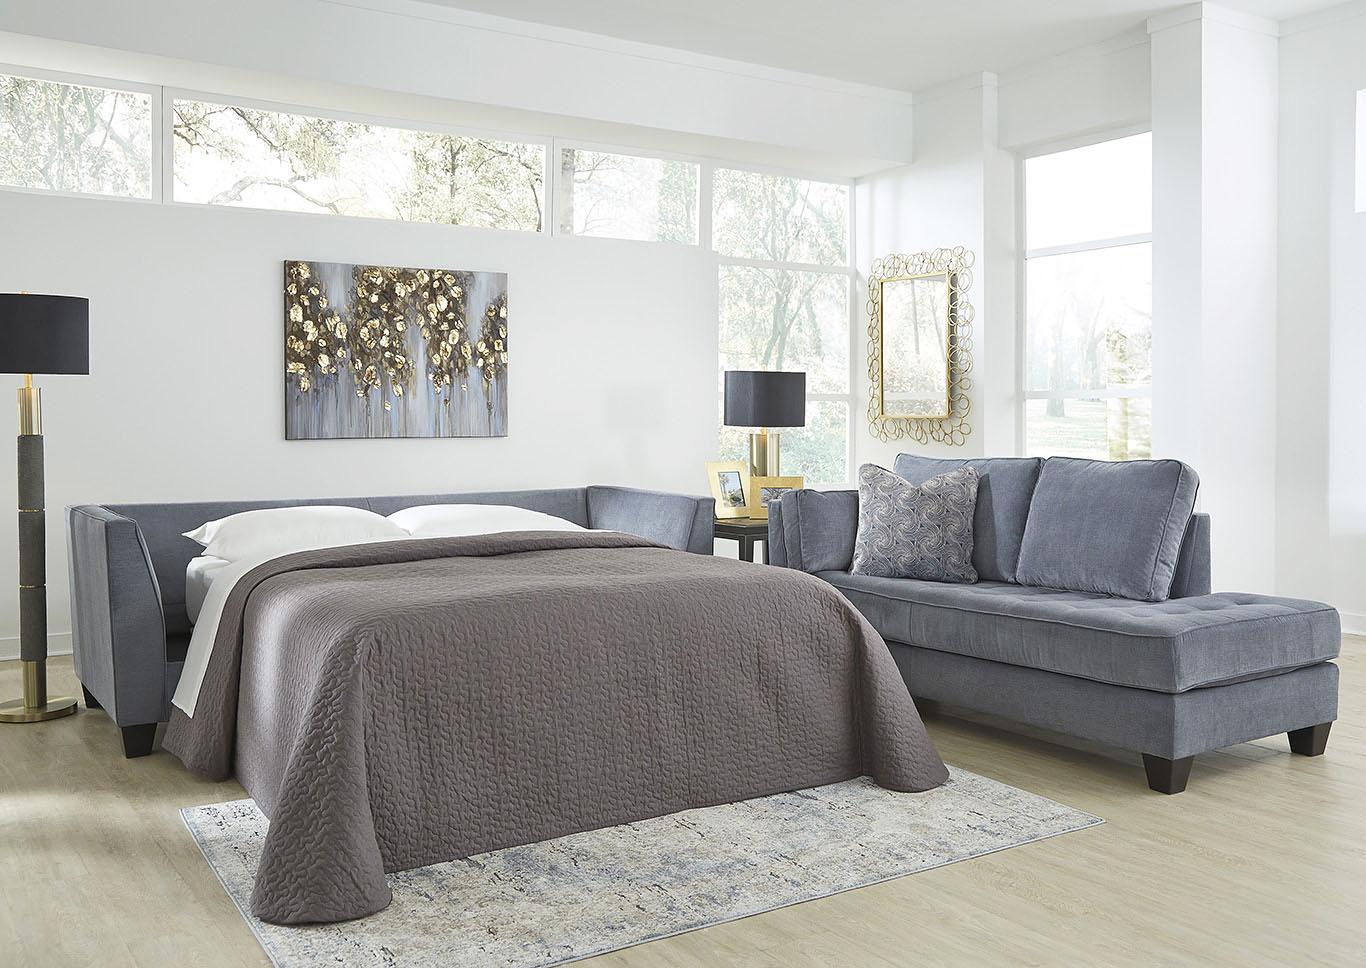 Wondrous 545056 Sciolo Cobalt Queen Sofa Sleeper Andrewgaddart Wooden Chair Designs For Living Room Andrewgaddartcom